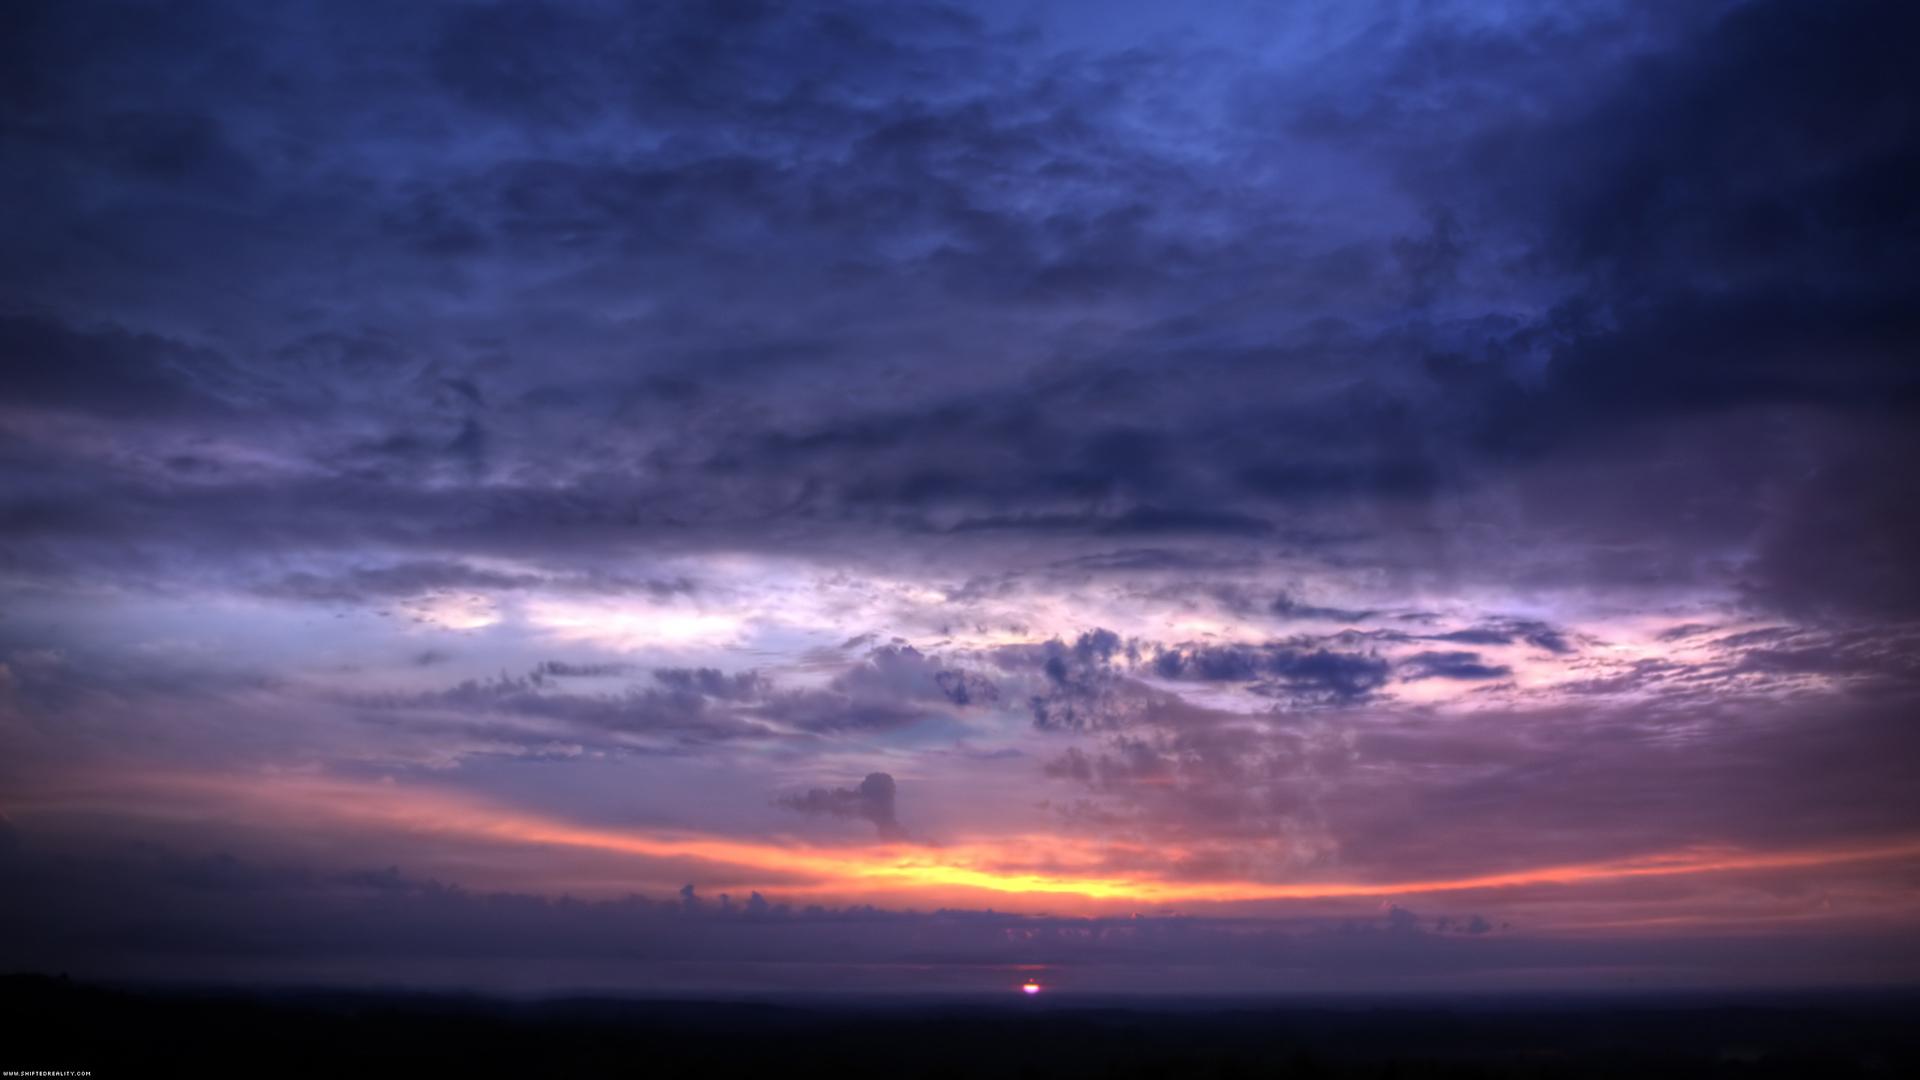 1920x1080 Sunset Landscapes wallpaper 1920x1080